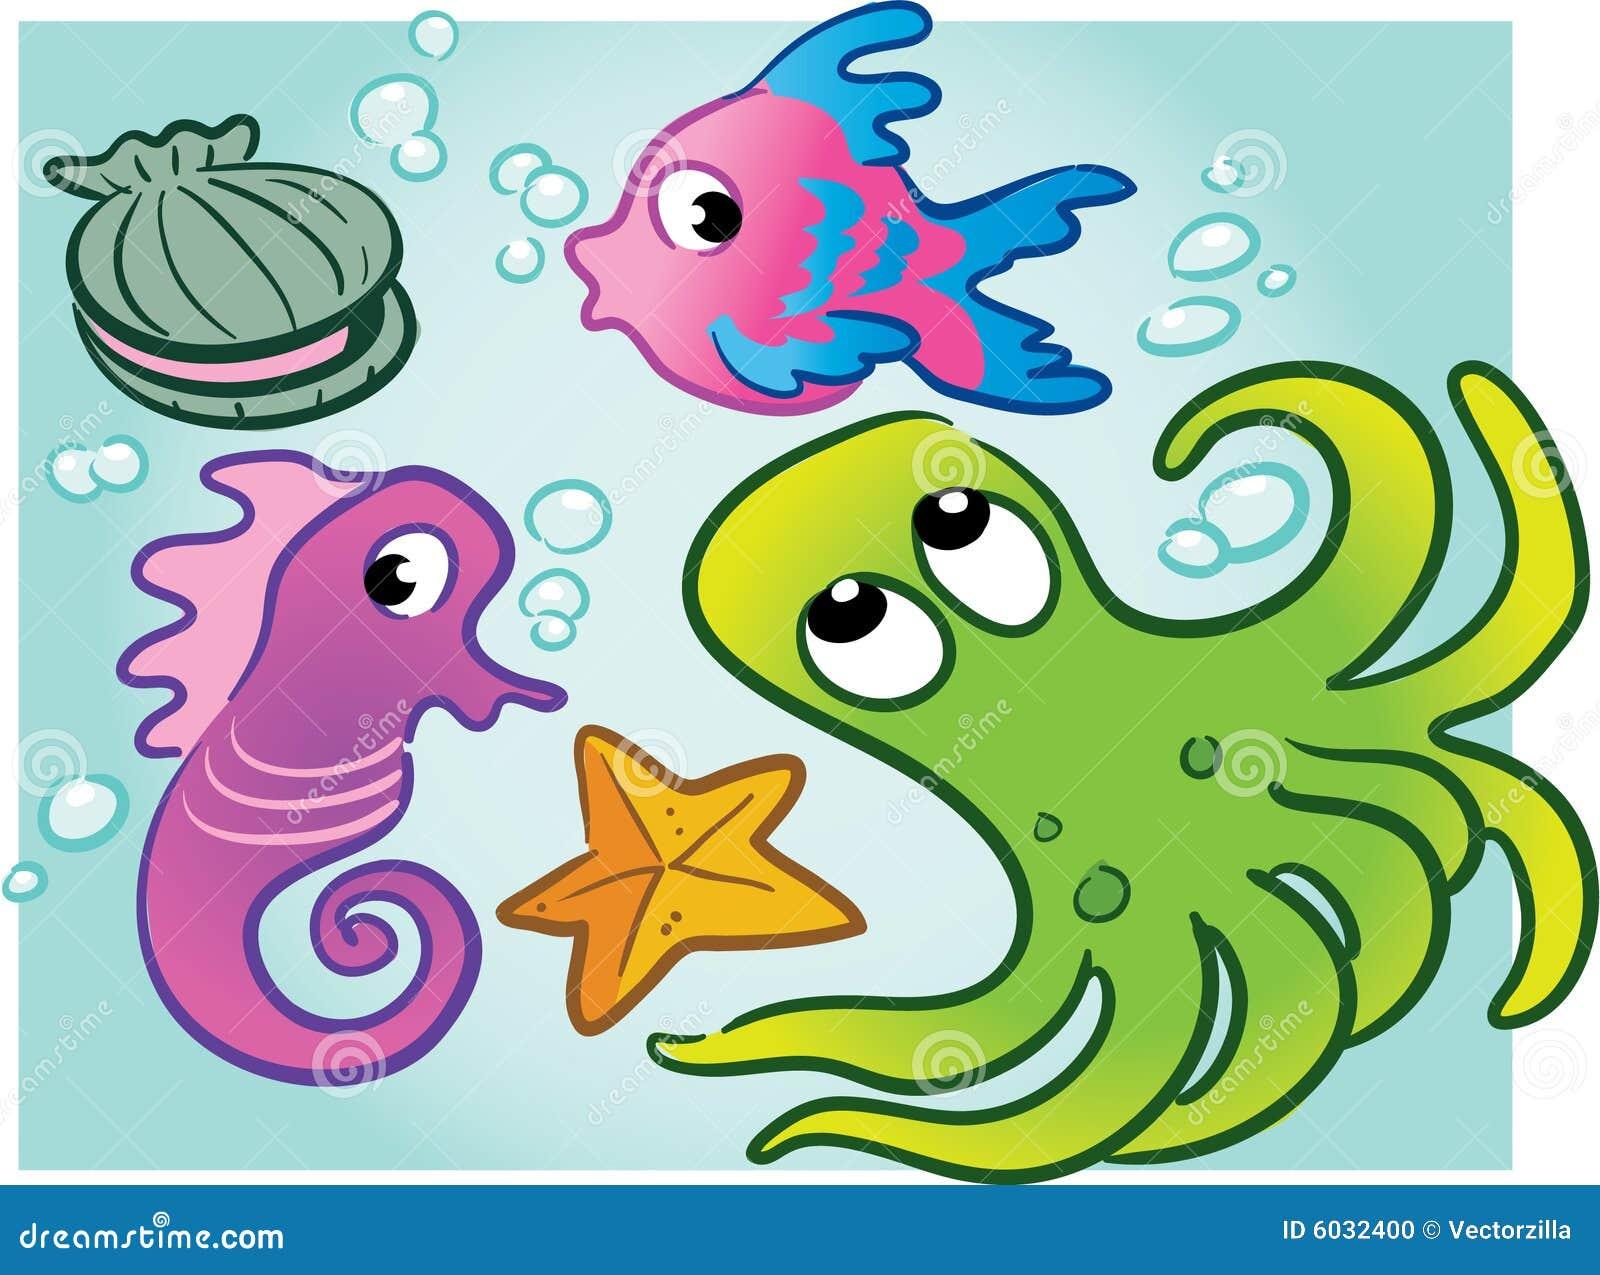 Can You Name These Underwater Sea Creatures? - Trivia Quiz - Zimbio